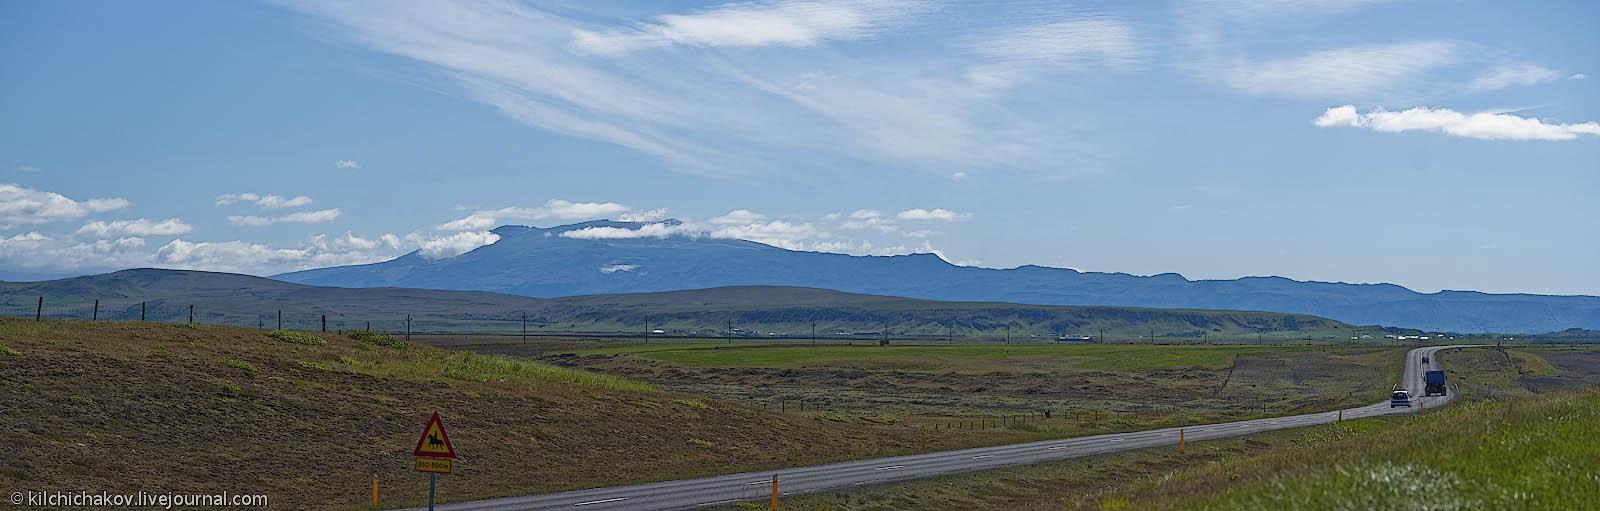 DSC07597-Panorama copy